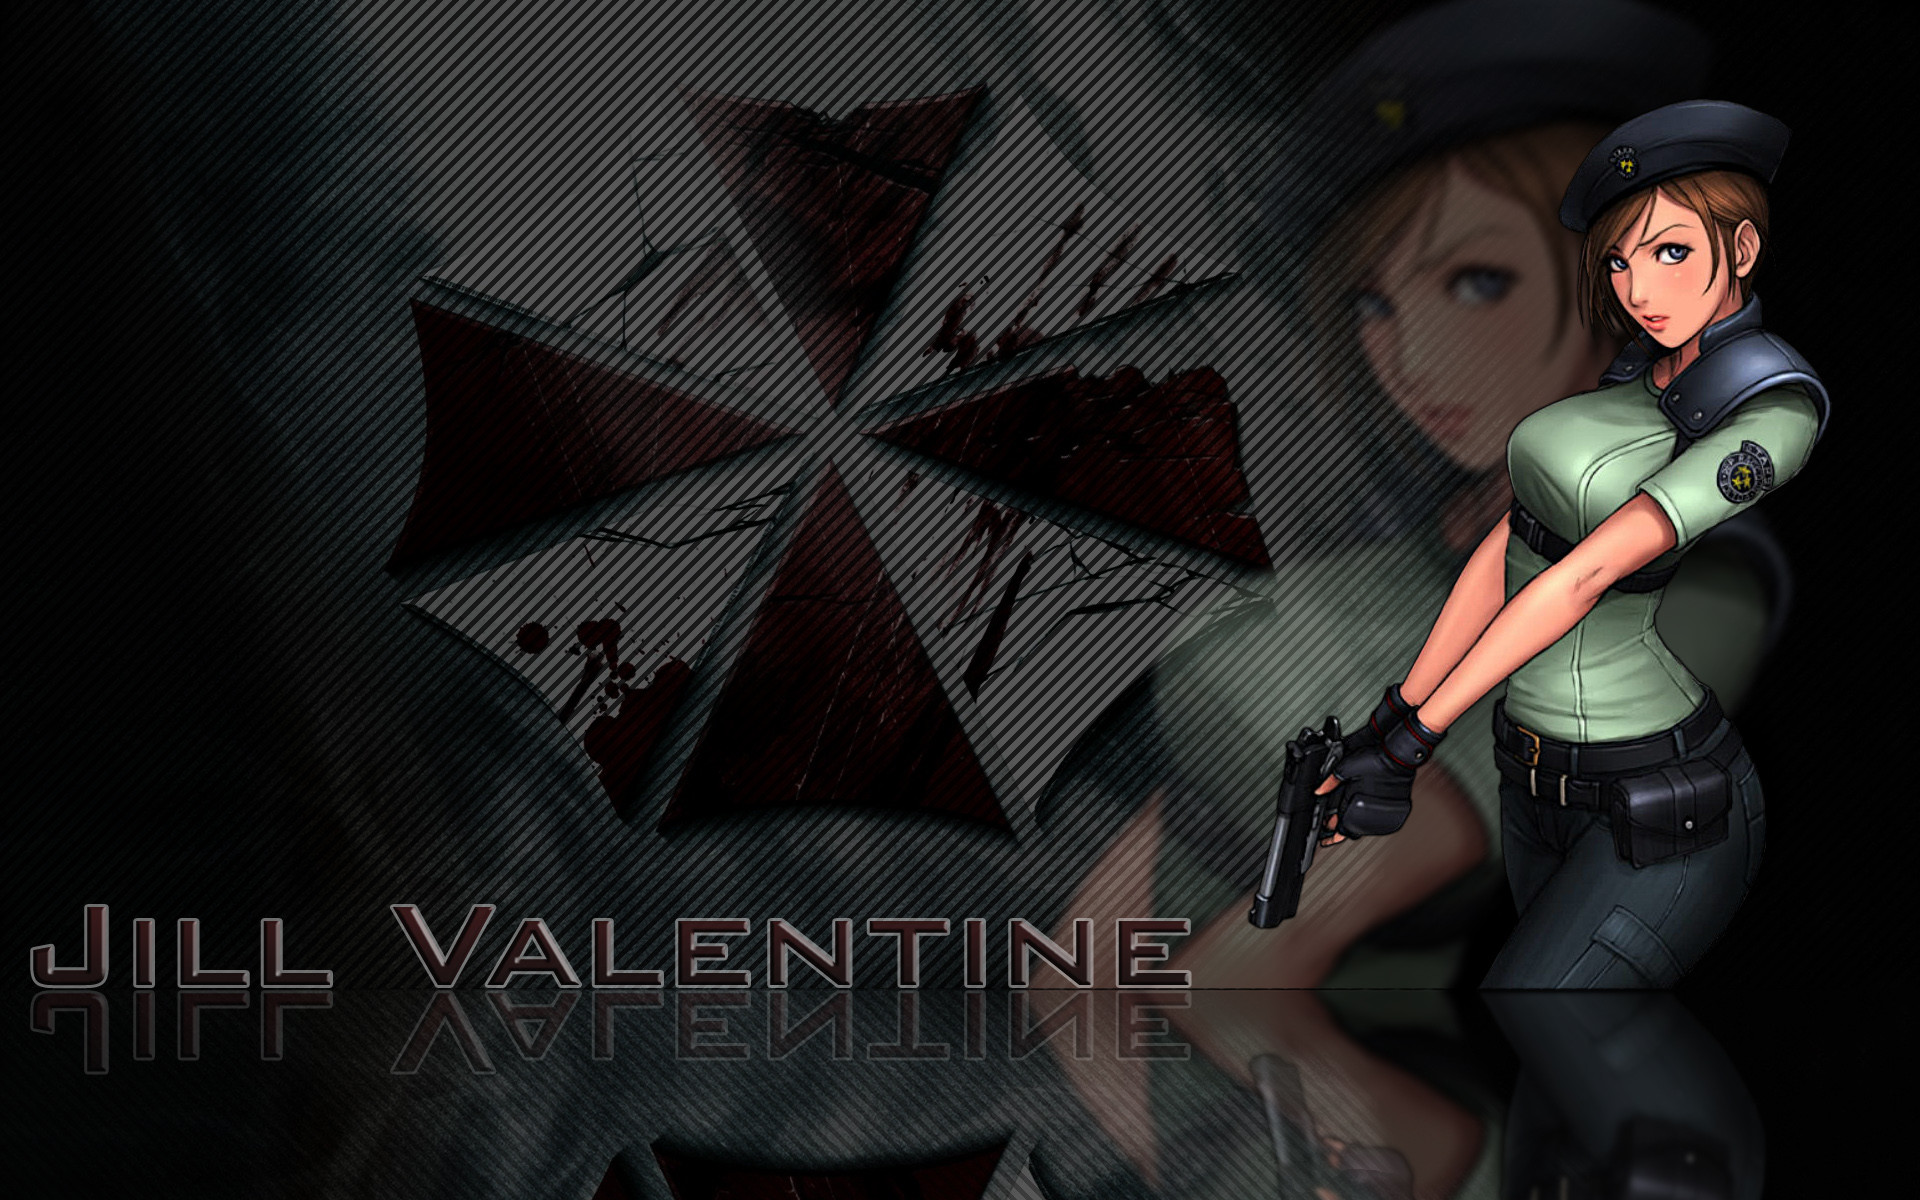 Video games Resident Evil Jill Valentine Umbrella Corp_ wallpaper |  | 203319 | WallpaperUP